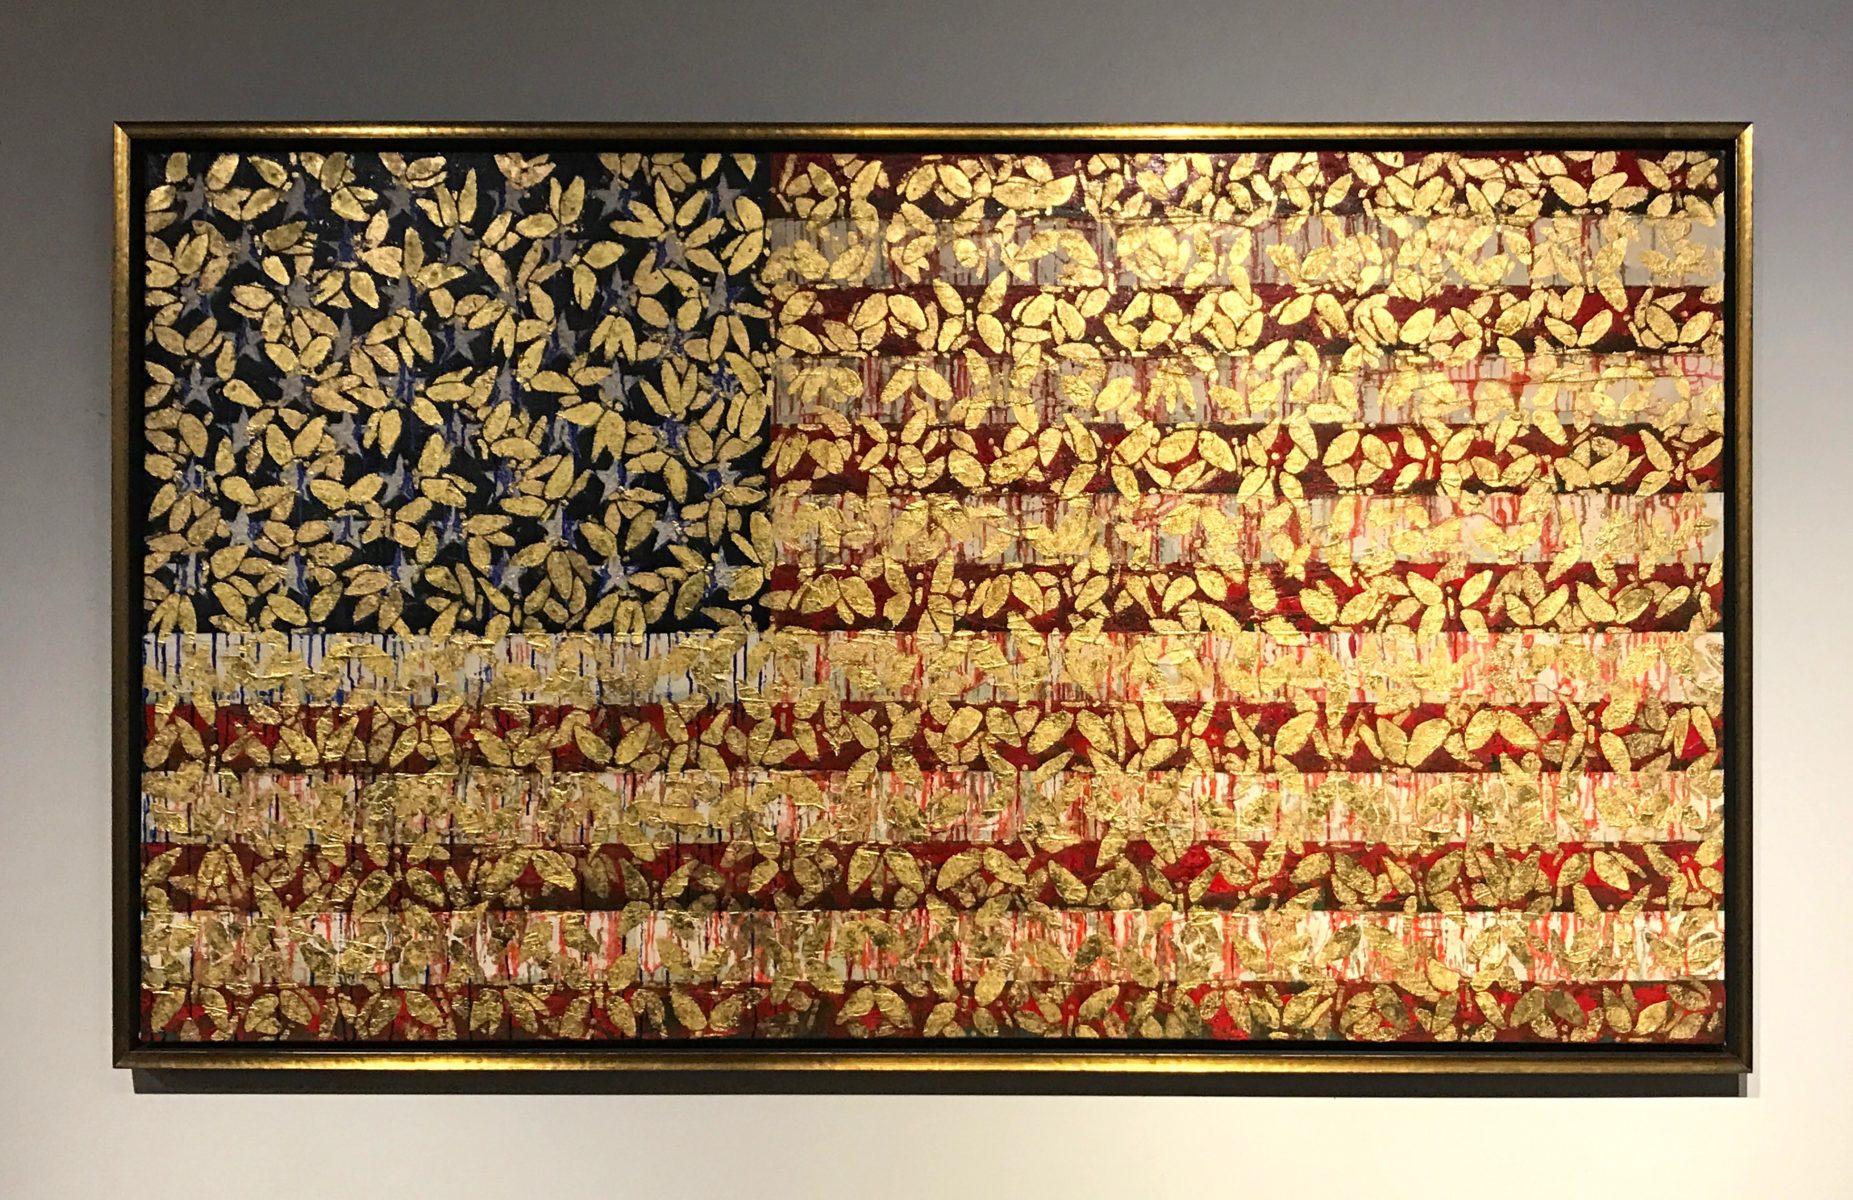 Portrait of Amerca 2017 (Industrial Melanism), 24 Karat Gold, oil on canvas, 44x78 in. <br> Courtesy of Eykyn Maclean